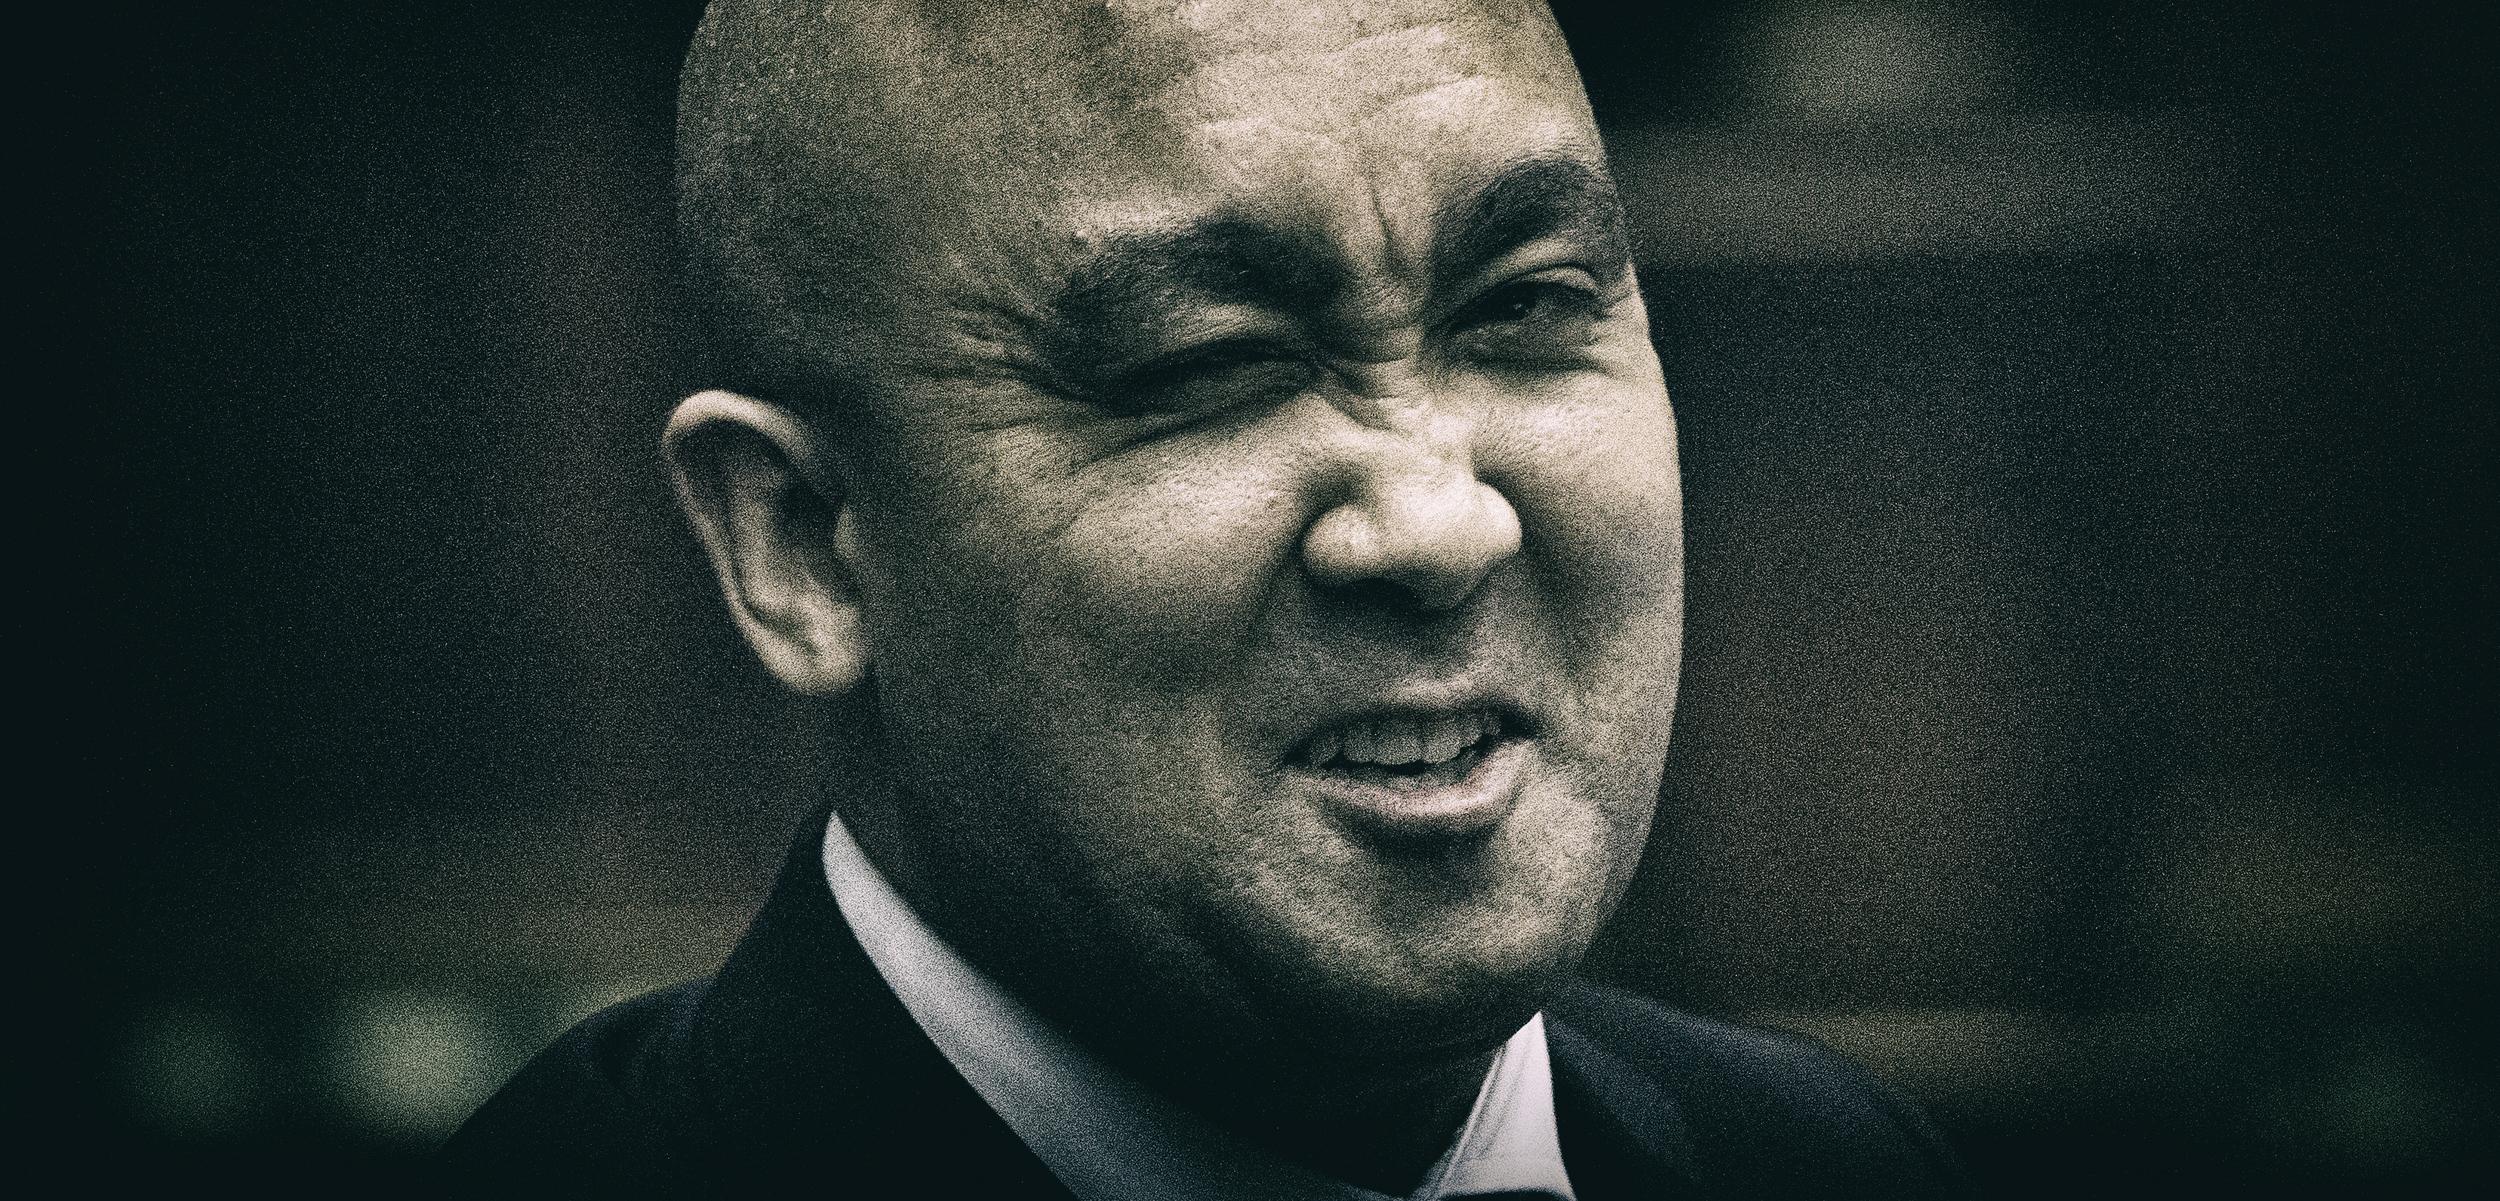 Who should take Shaun Abrahams place as NPA head